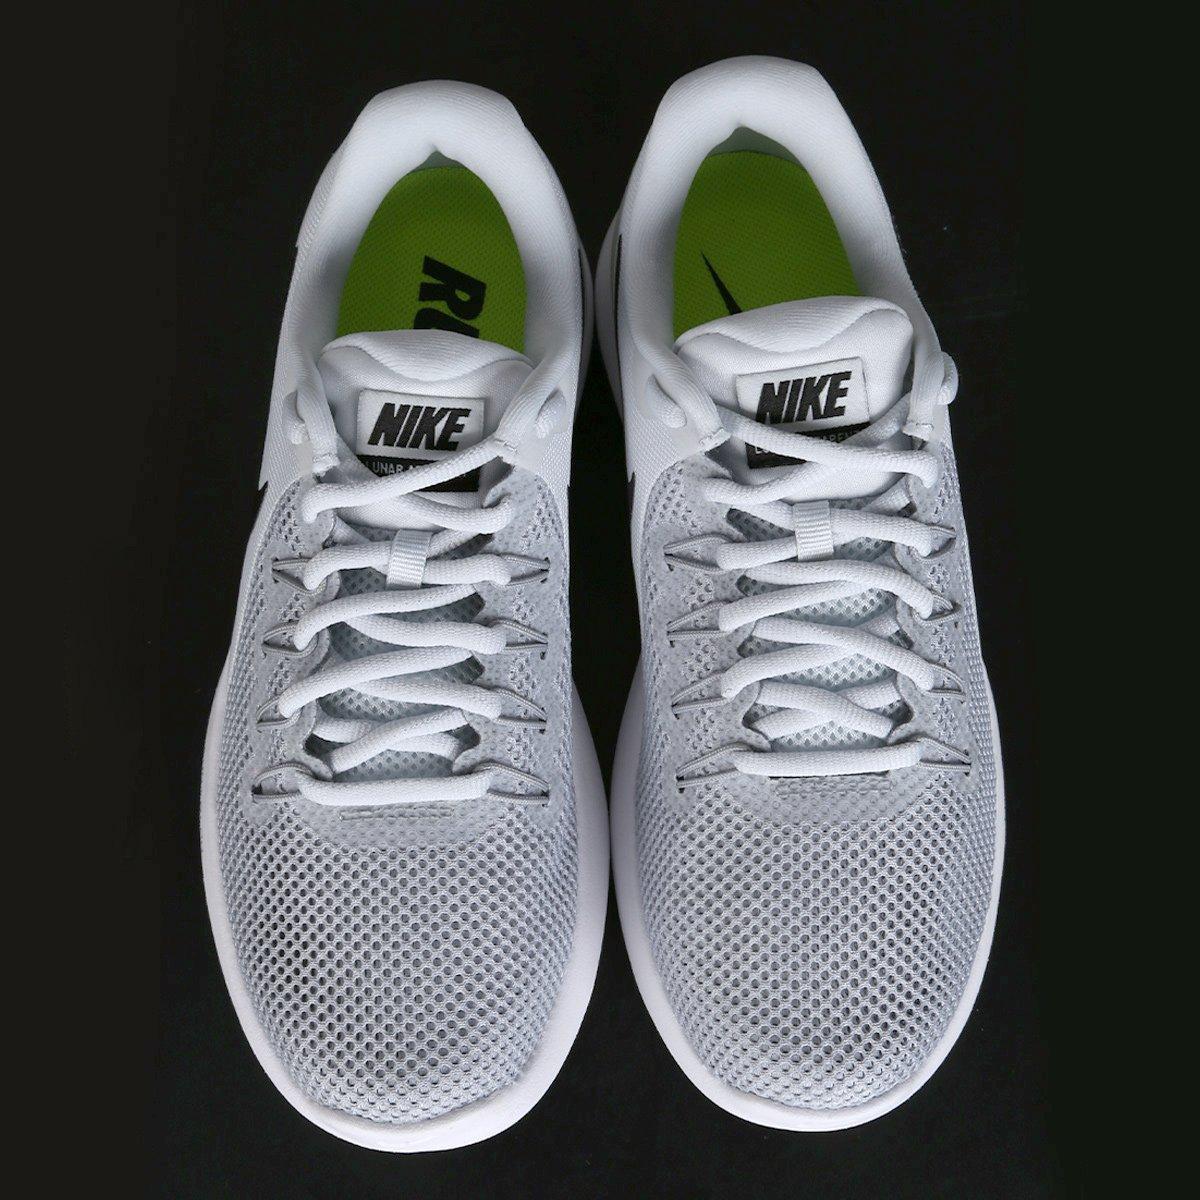 Tênis Nike Lunar Apparent Feminino  Tênis Nike Lunar Apparent Feminino ... cd9758080880f